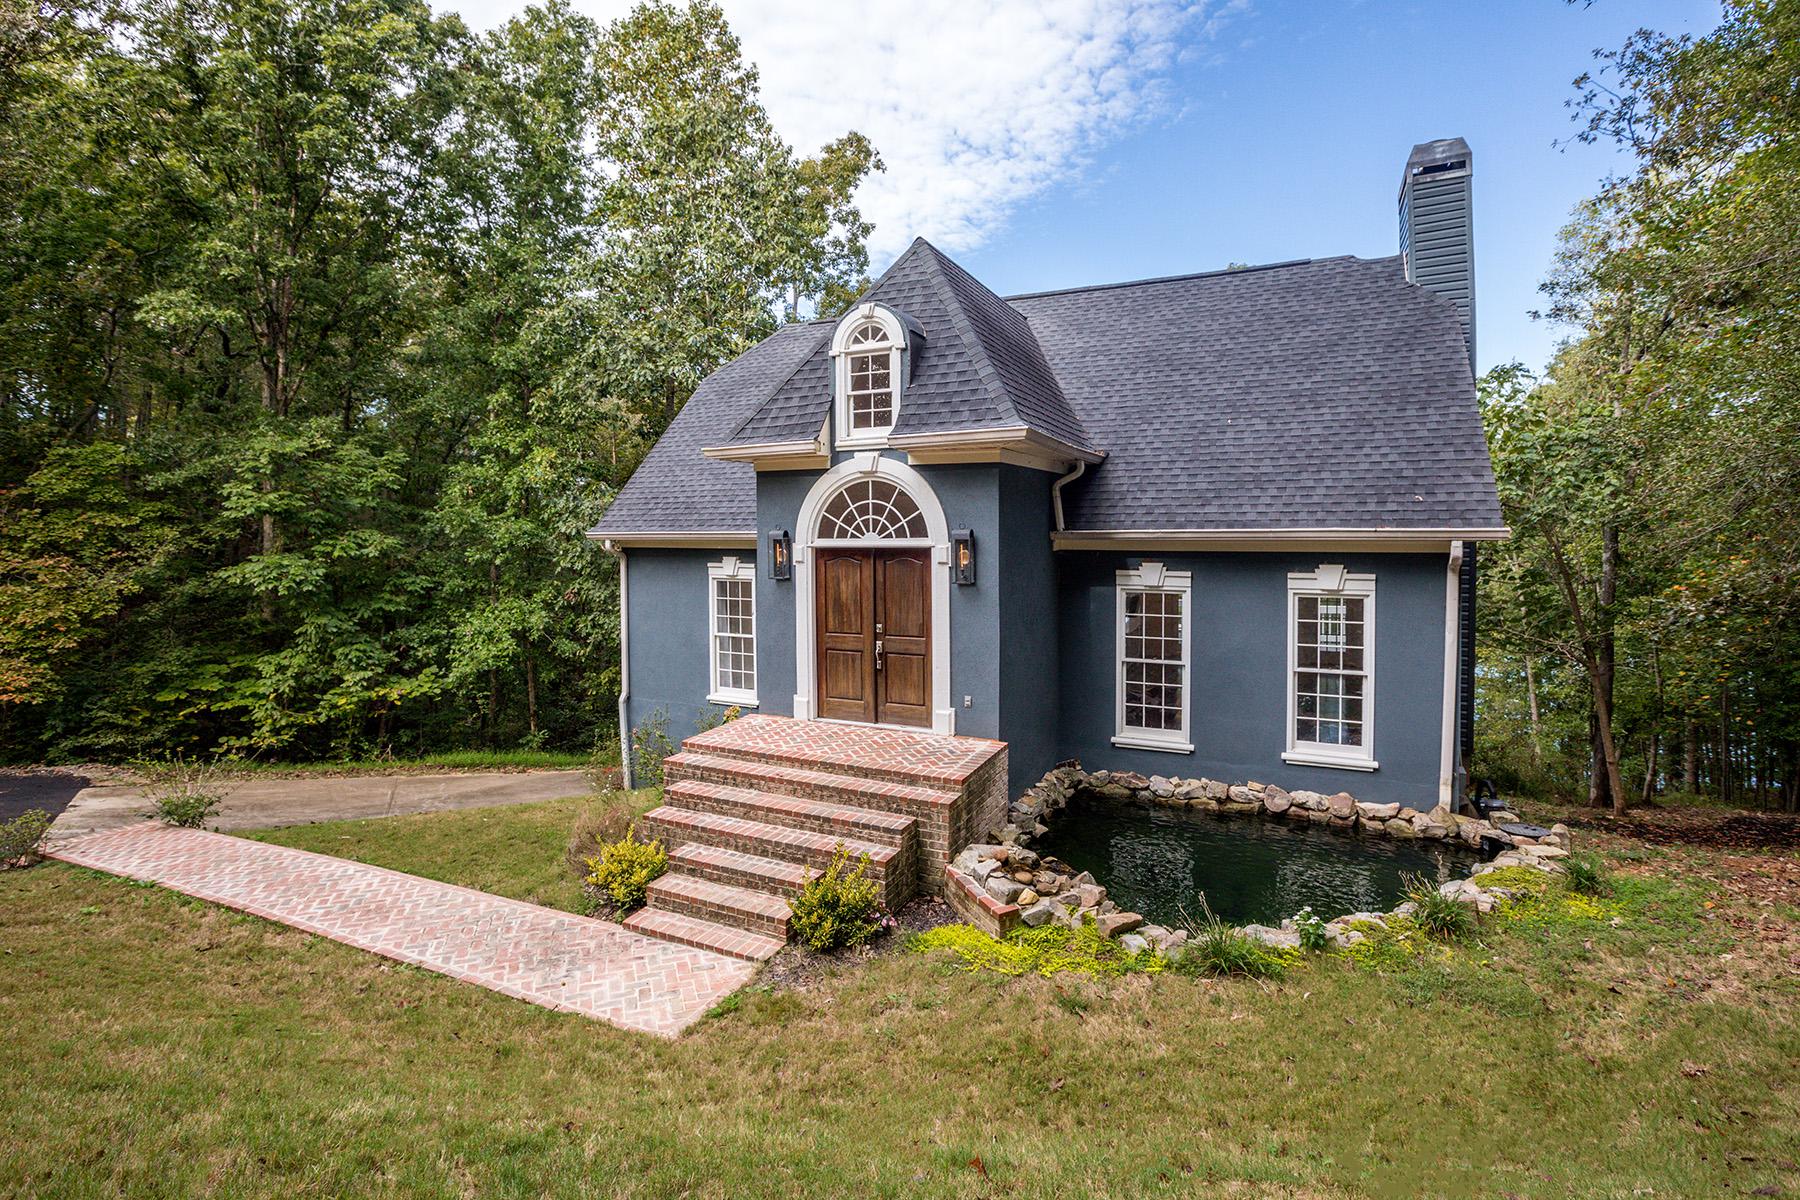 Single Family Home for Sale at Lake Lanier Retreat 4215 Cagle Road Lula, Georgia 30554 United States